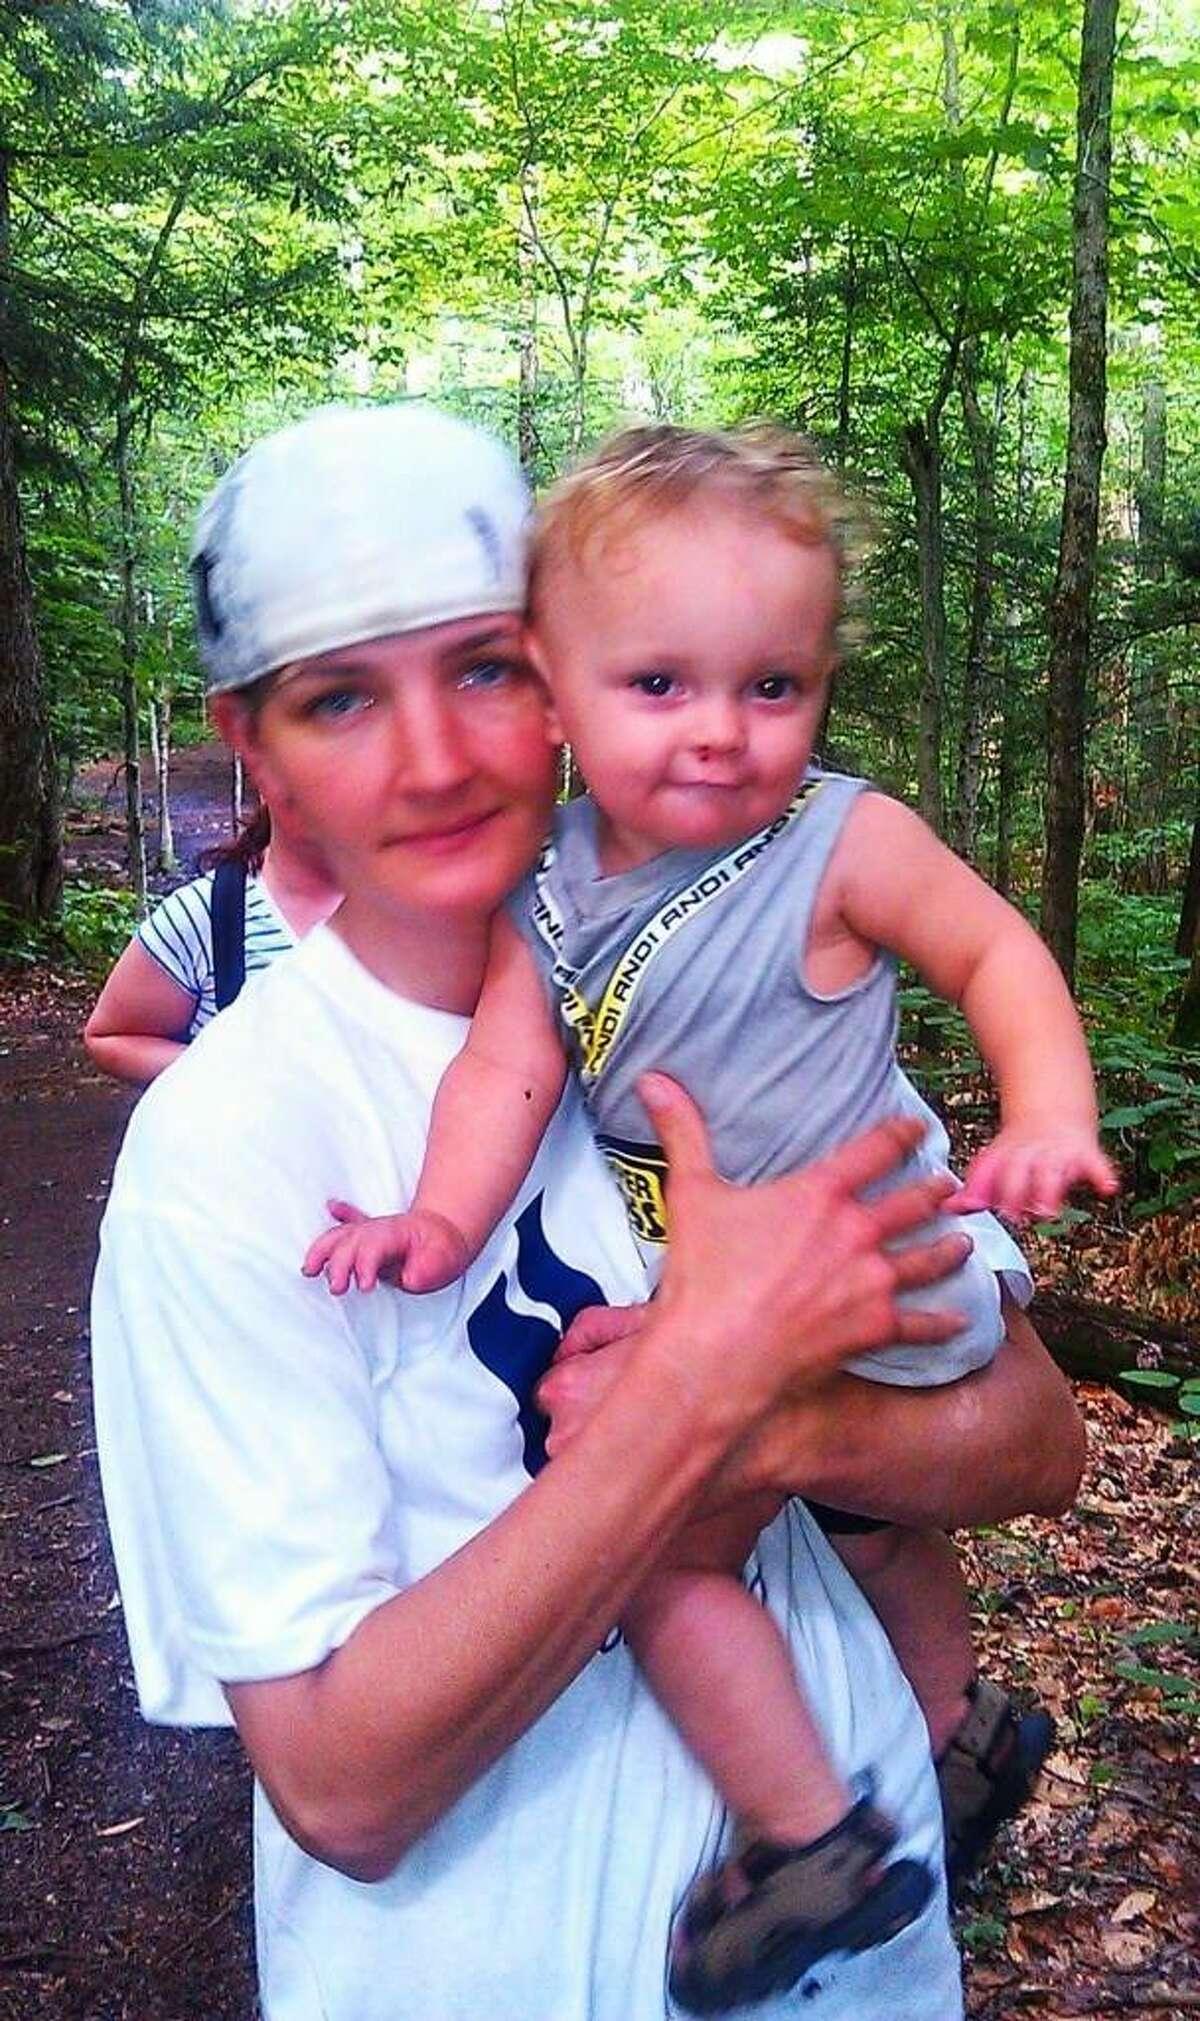 Brenda Hotaling with her son, Eli, 1. Eli died Dec. 9 after swallowing liquid nicotine. ORG XMIT: y0xAv_1ICFxCGYTNJfnY